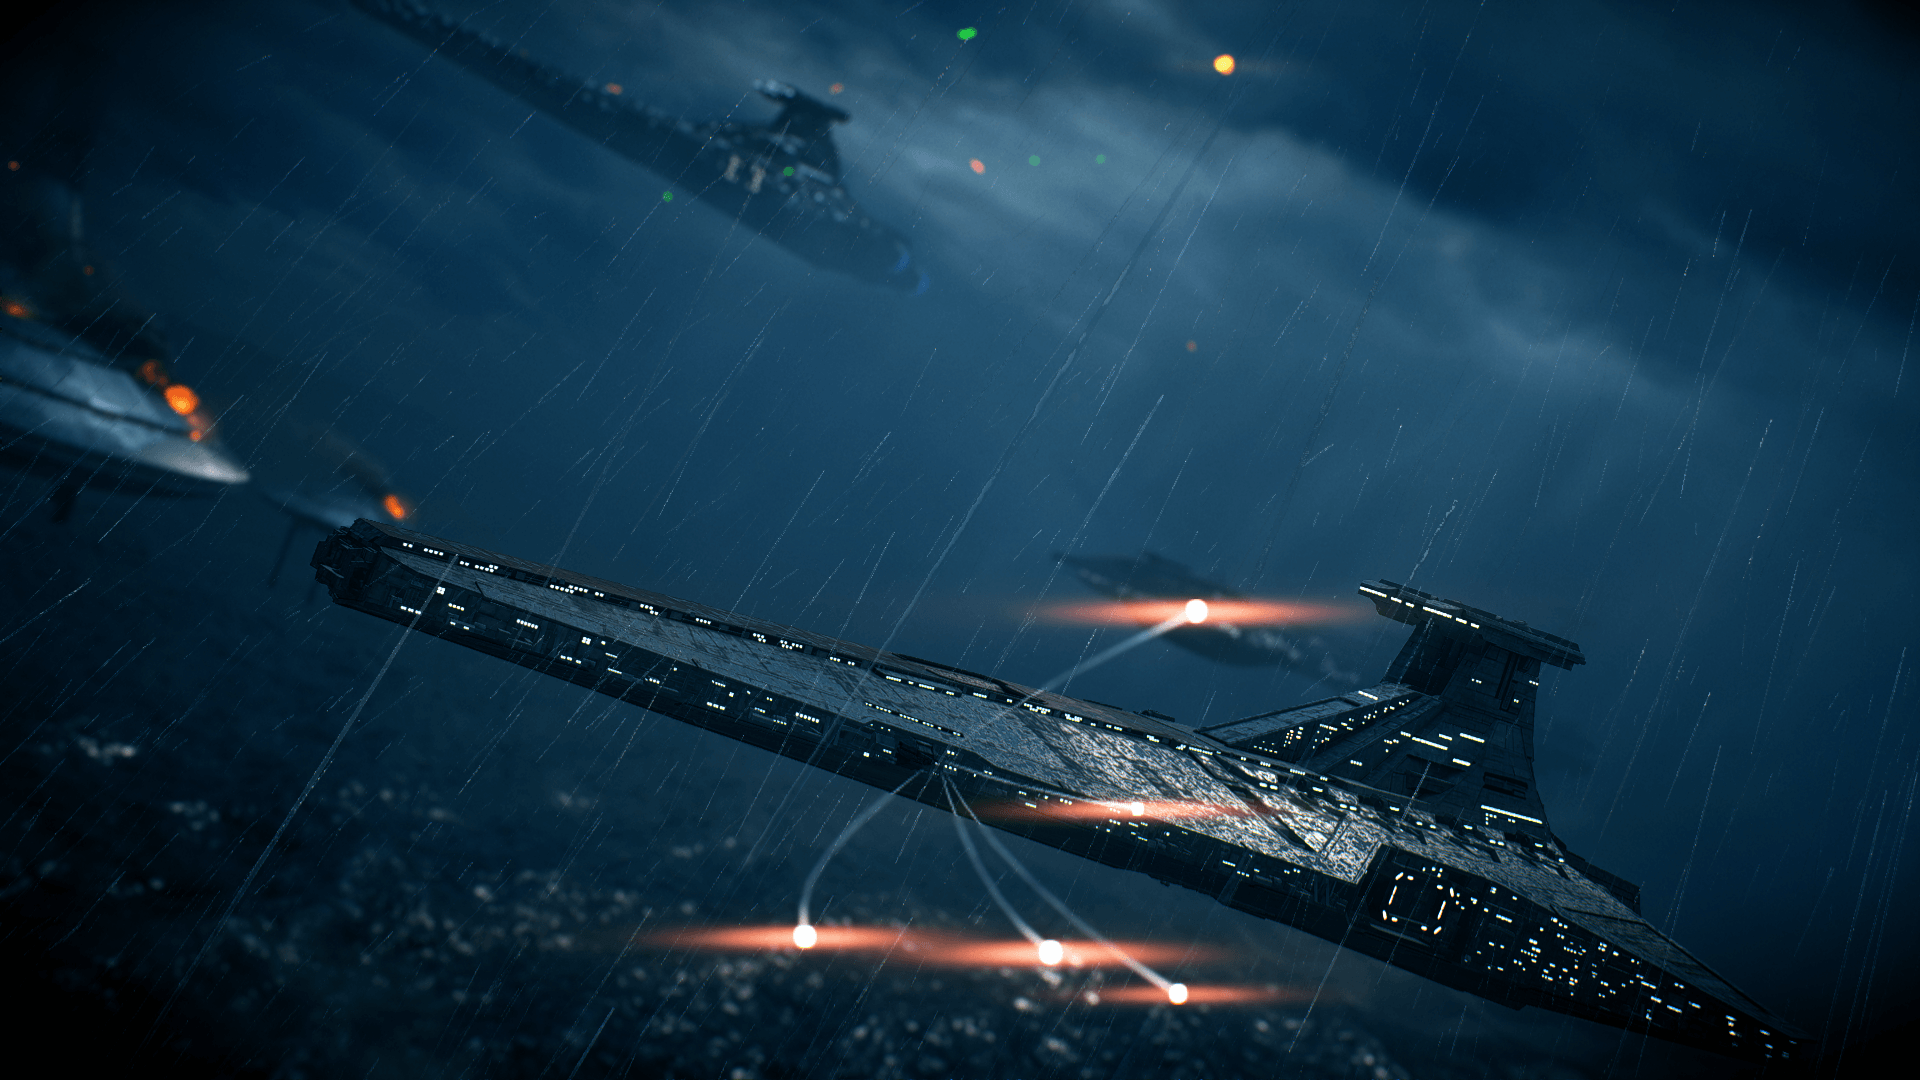 Venator-class Star Destroyer Wallpapers - Wallpaper Cave